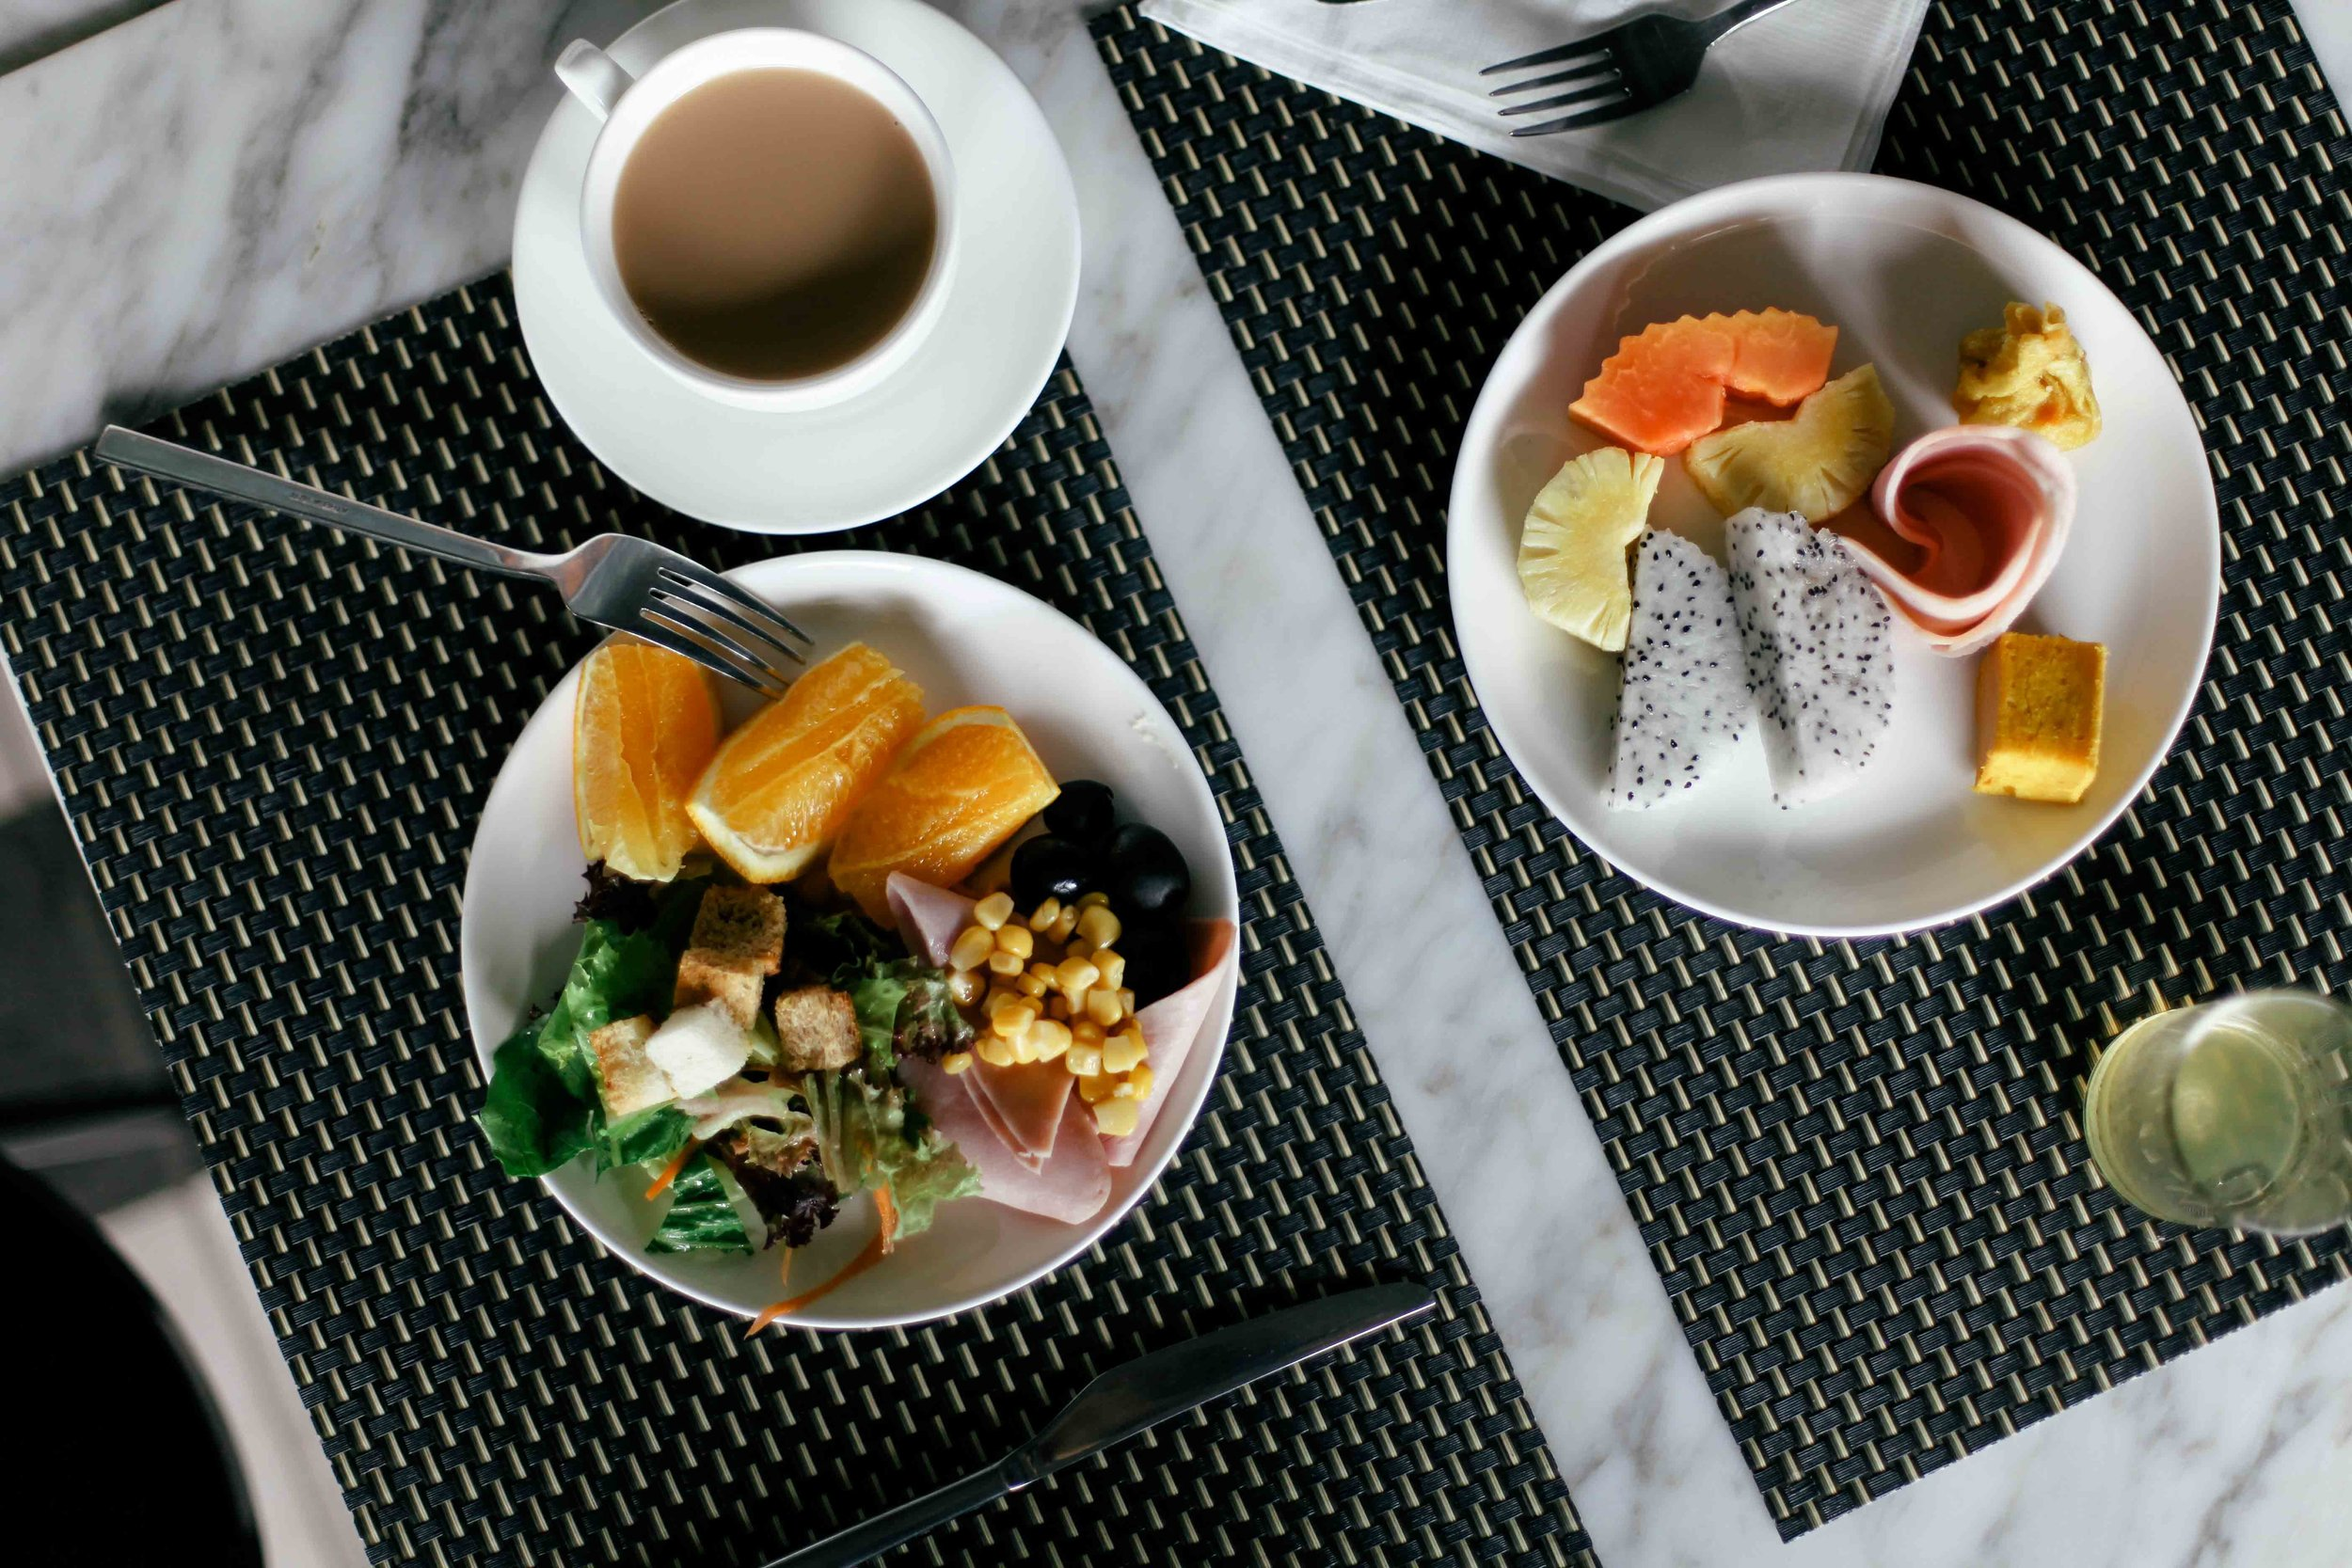 Good breakfast selection